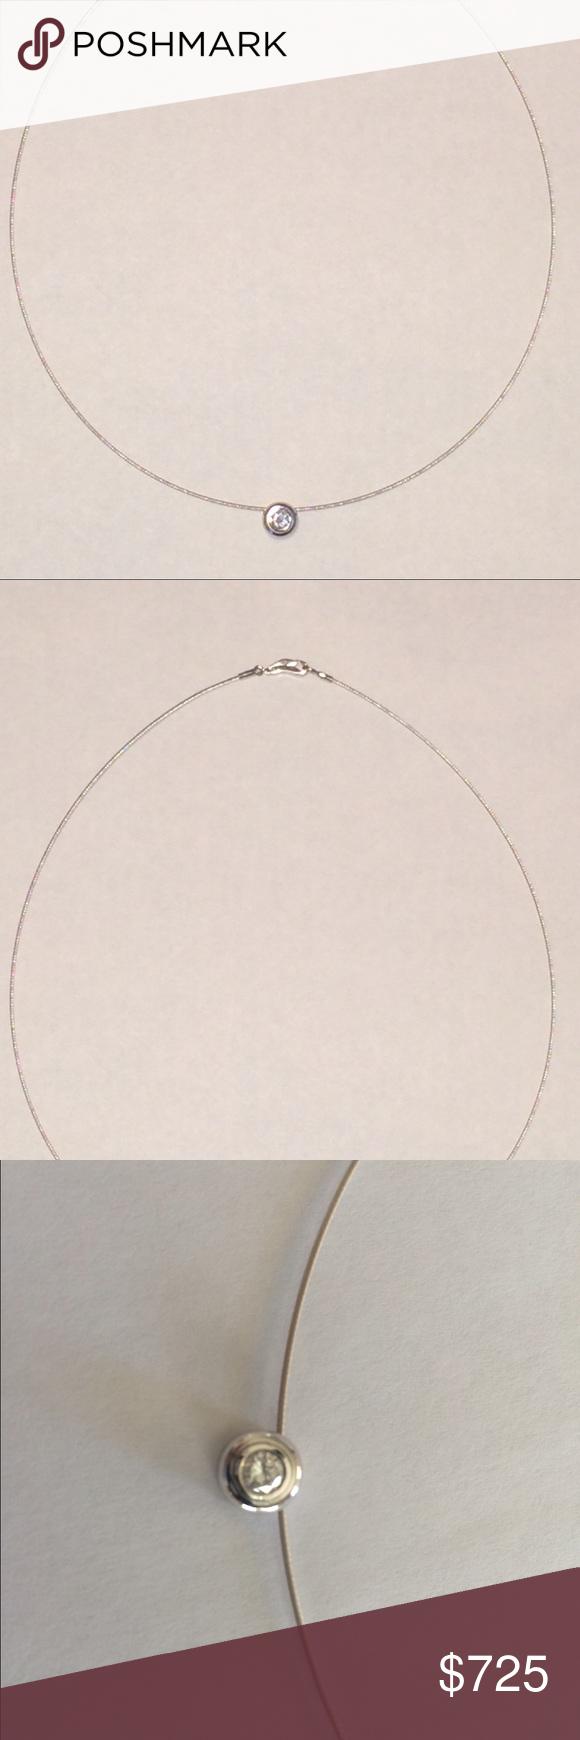 Custom 1 3 Carat Diamond Necklace White Gold Jewelry Necklaces Solitaire Pendant Necklace White Gold Jewelry